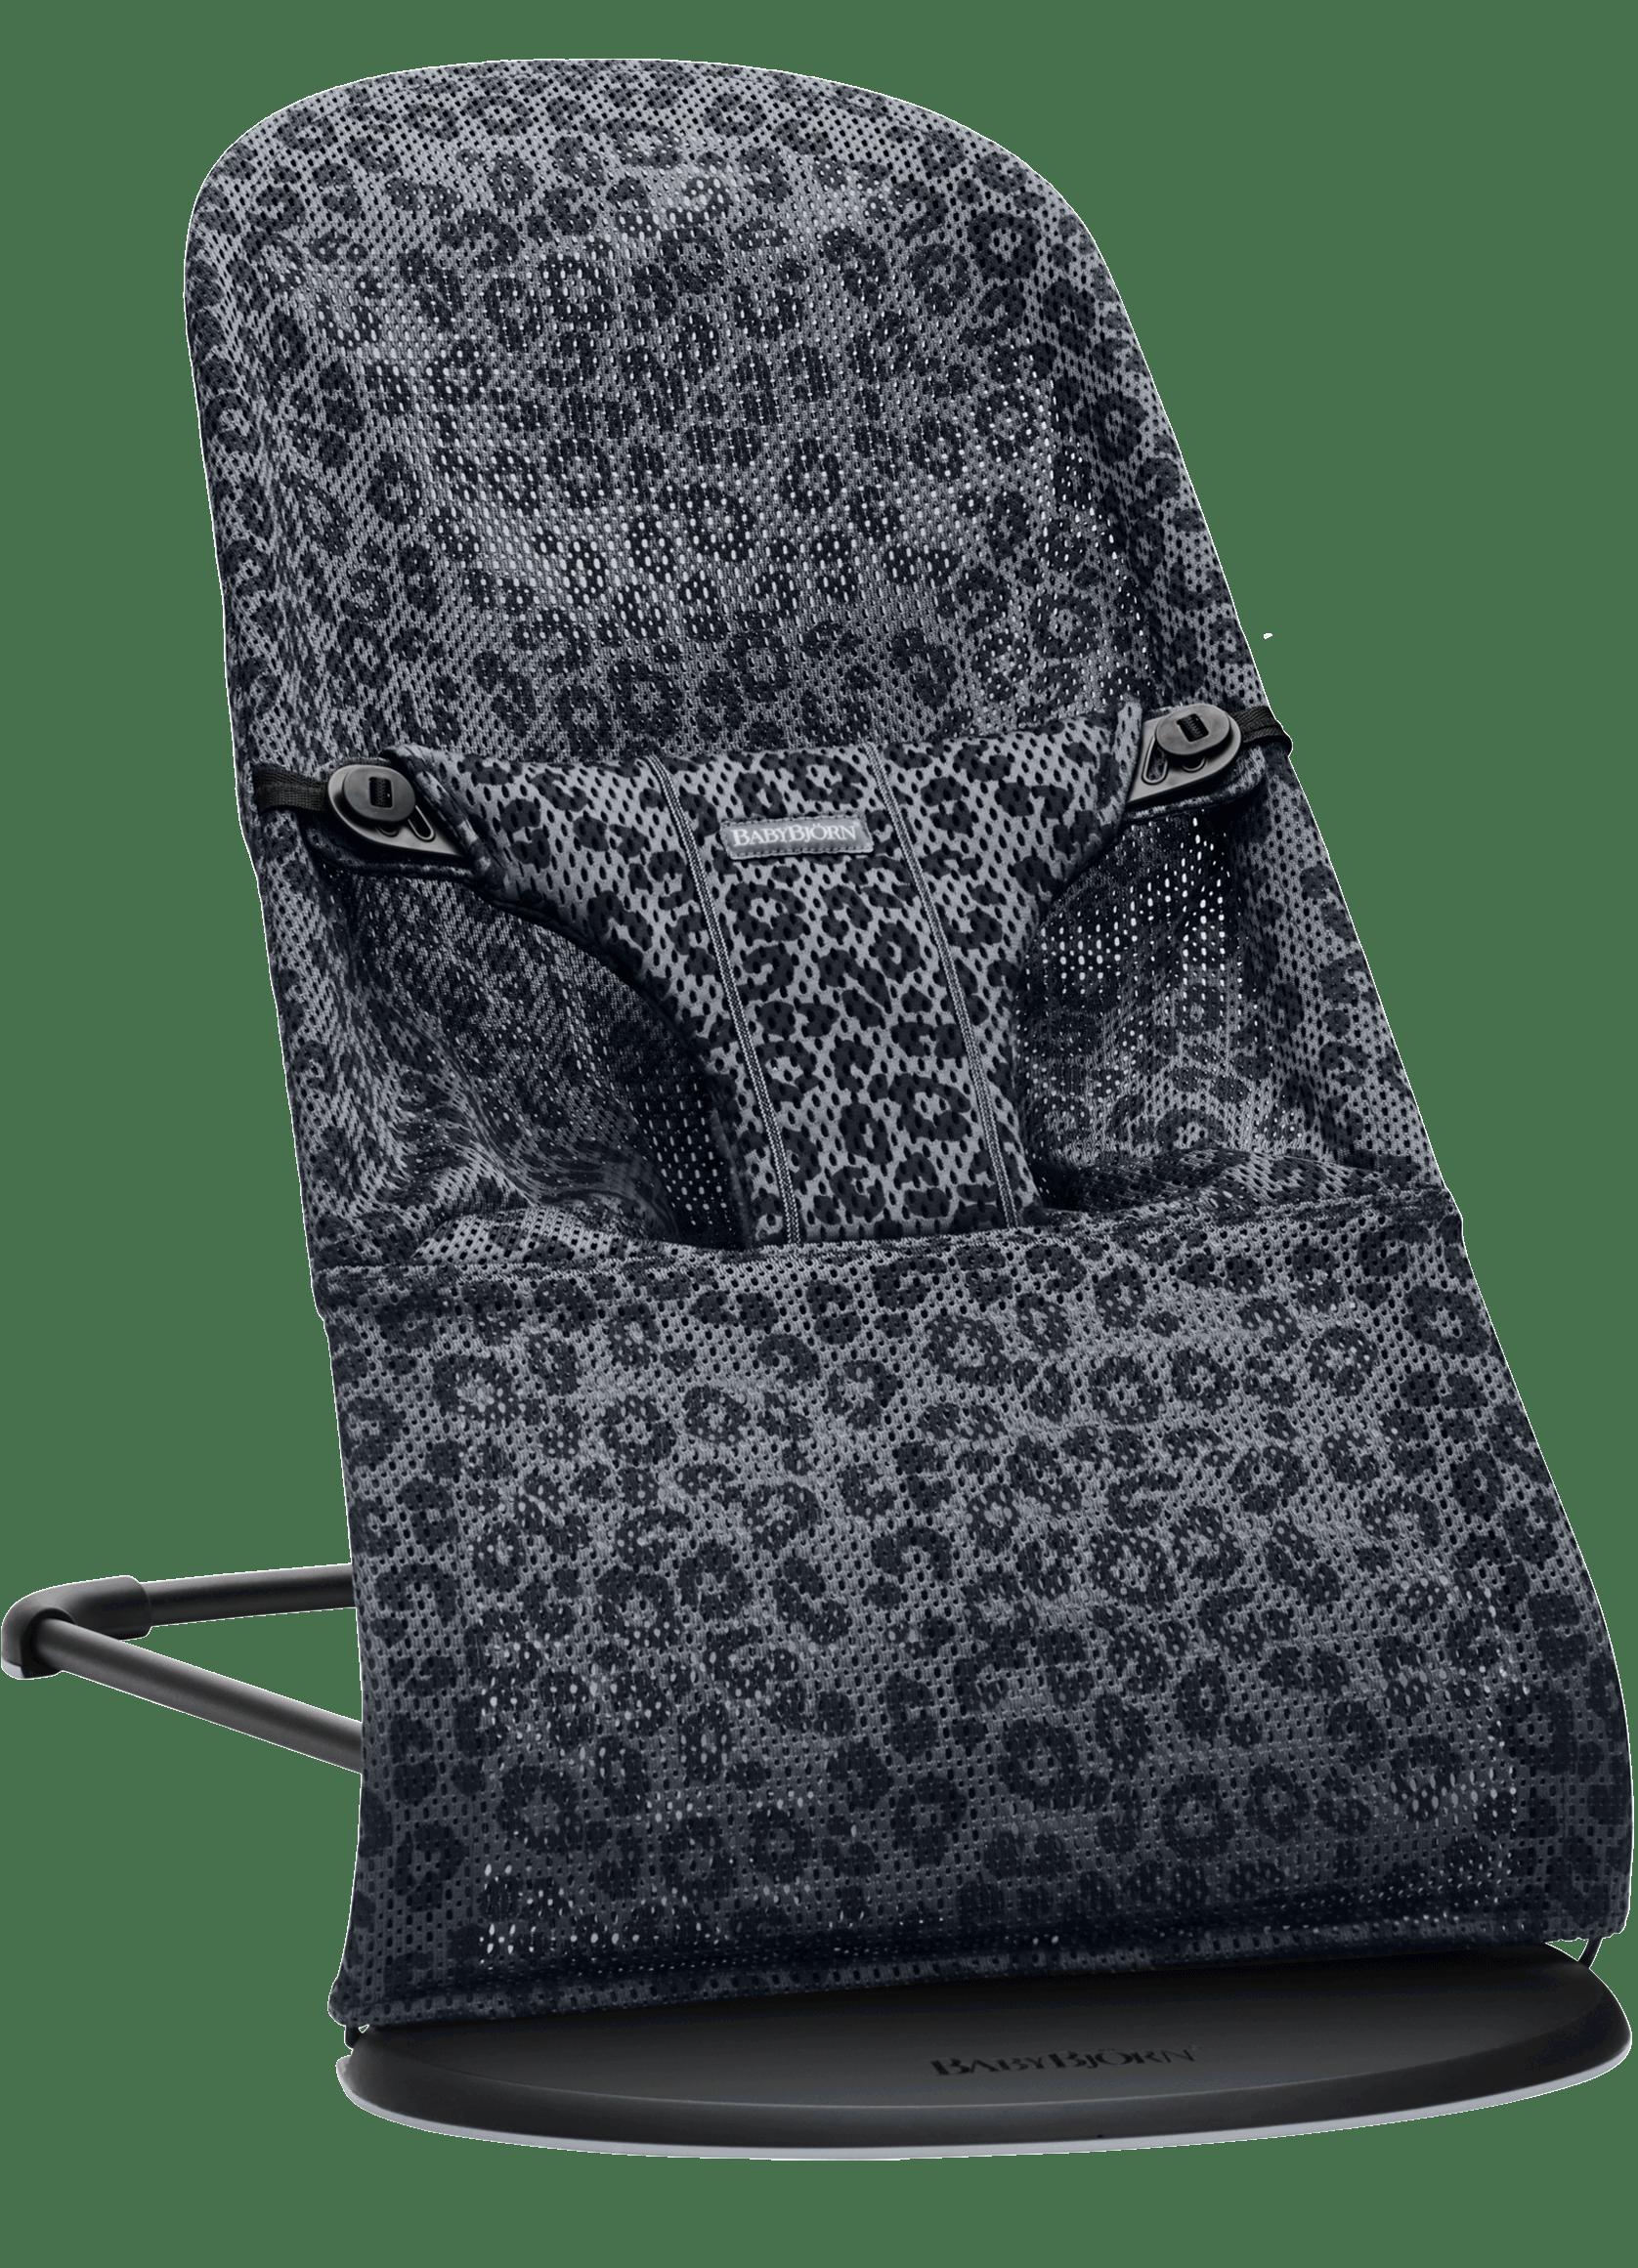 babybjorn-hamaca-bliss-antracita-leopardo